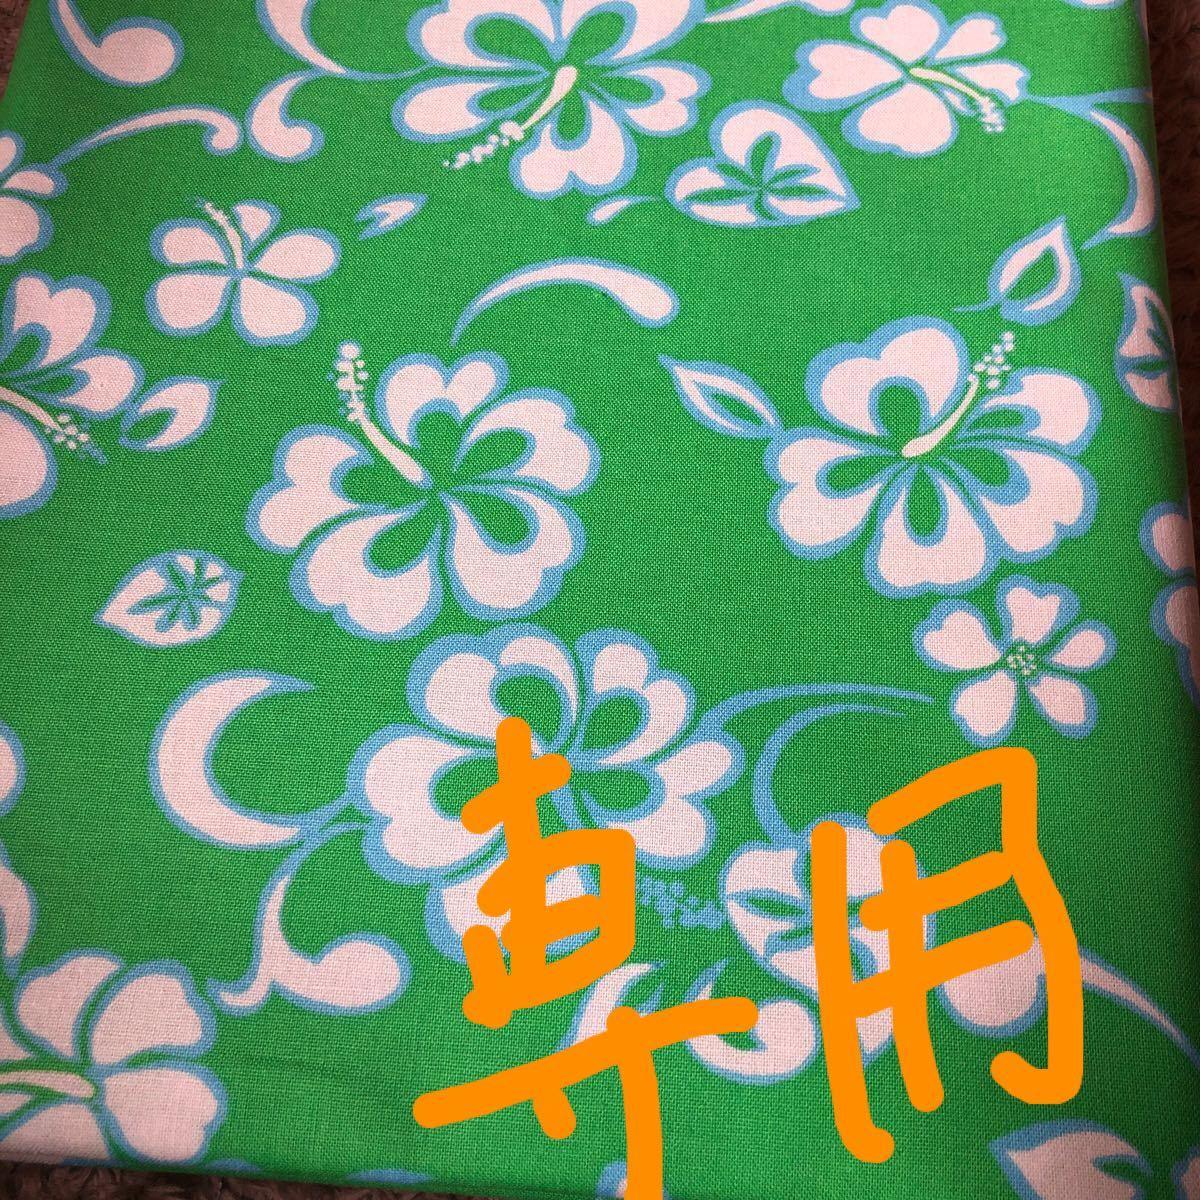 mirurun様専用★ 綿100%シーチング生地 花柄 グリーン 110×200cm